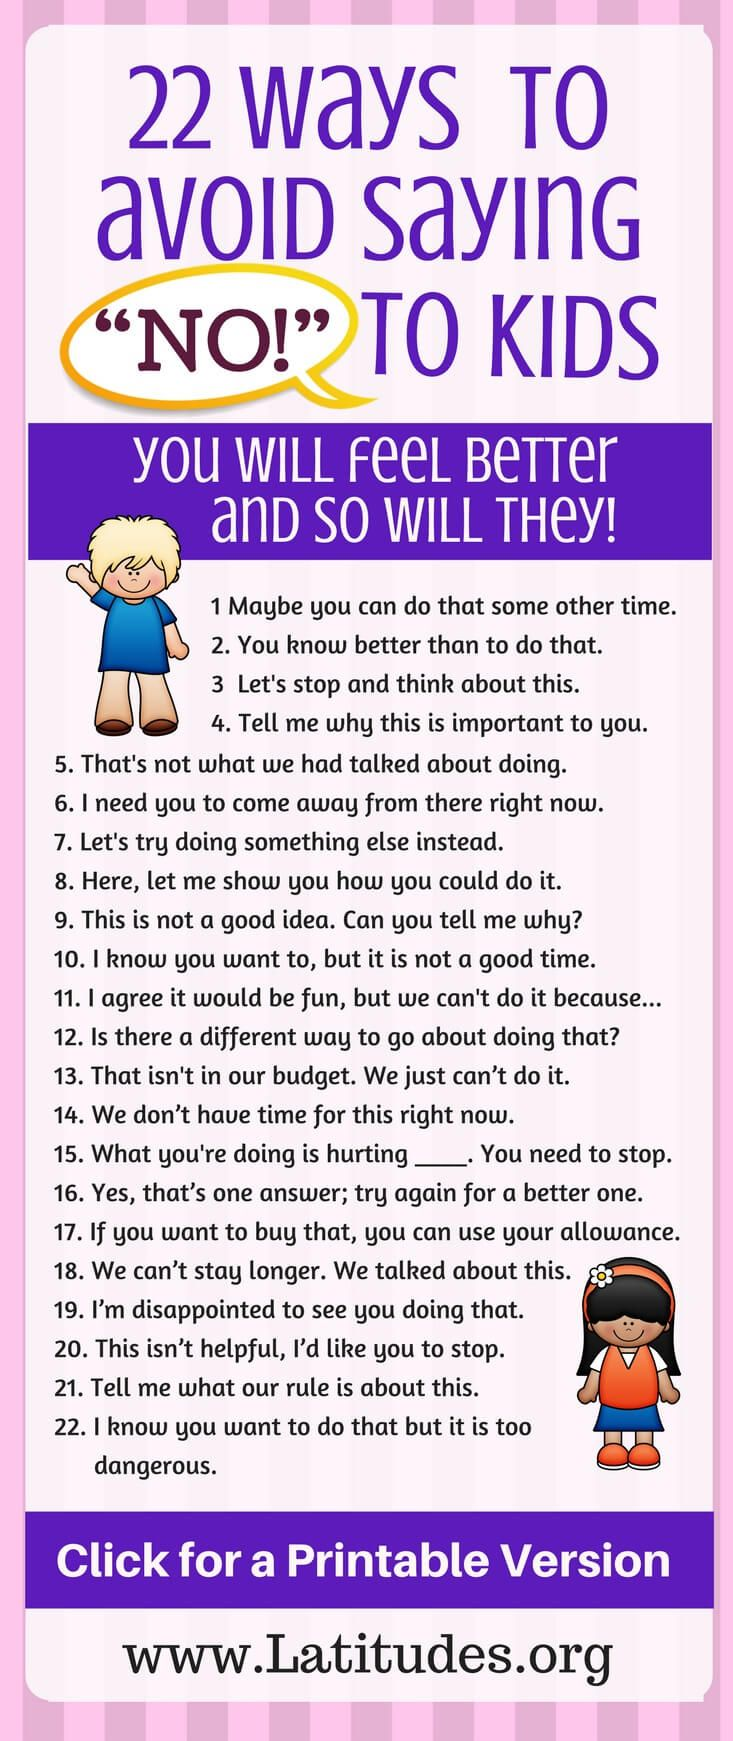 "22 Ways to Avoid Saying ""NO"" to Kids #ParentingTIps #ChildBehavior #TeacherTips #parenting #ClassroomBehavior #ParentingHacks"